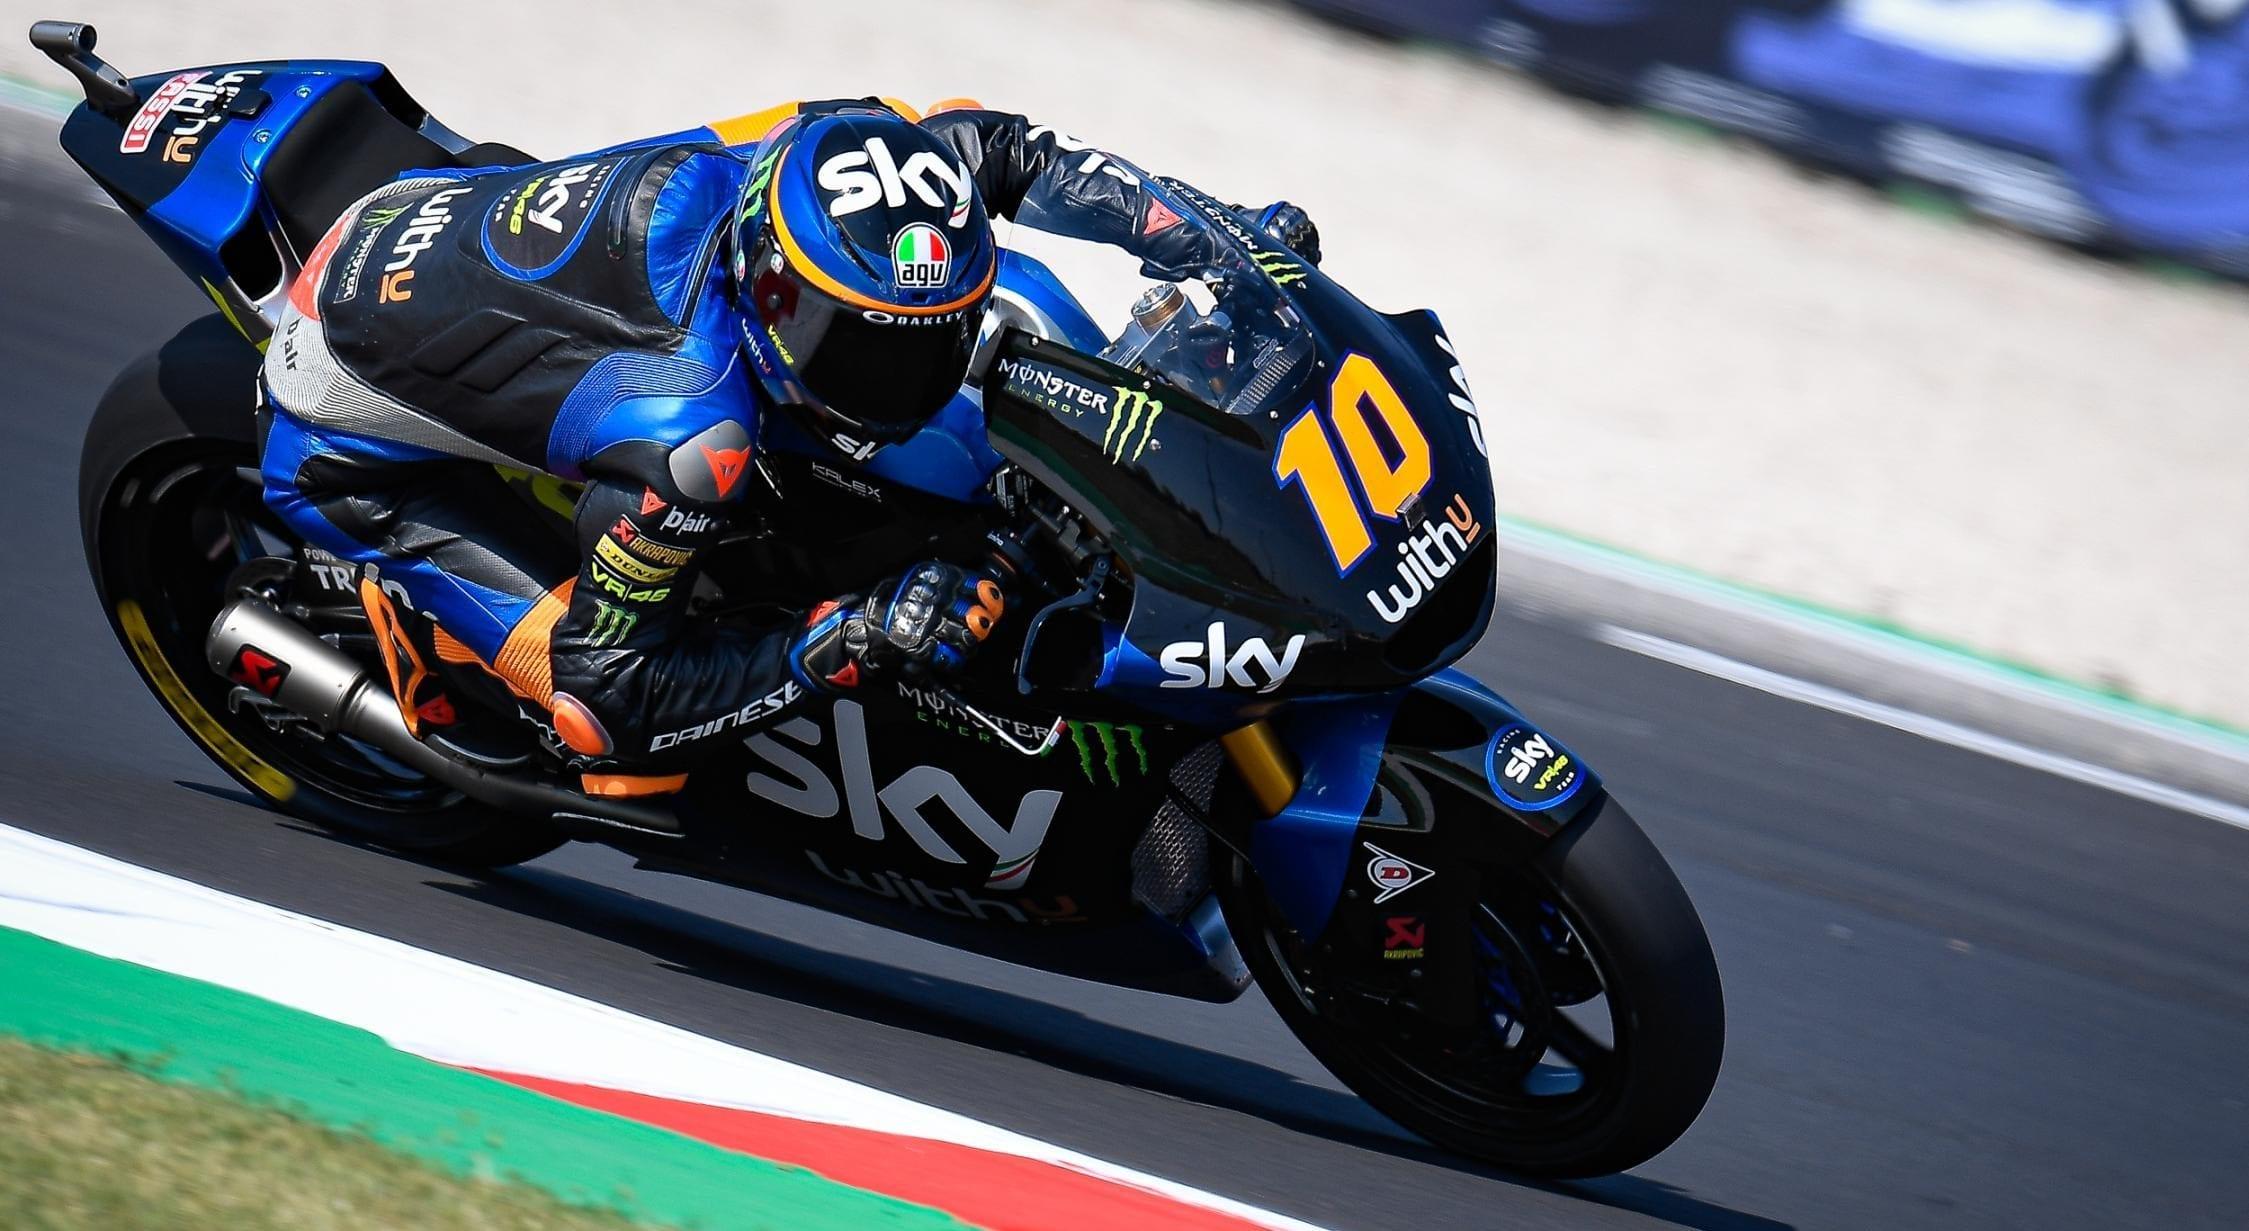 MotoGP Misano: Luca Marini wins his home Moto2 race - Everything Moto Racing